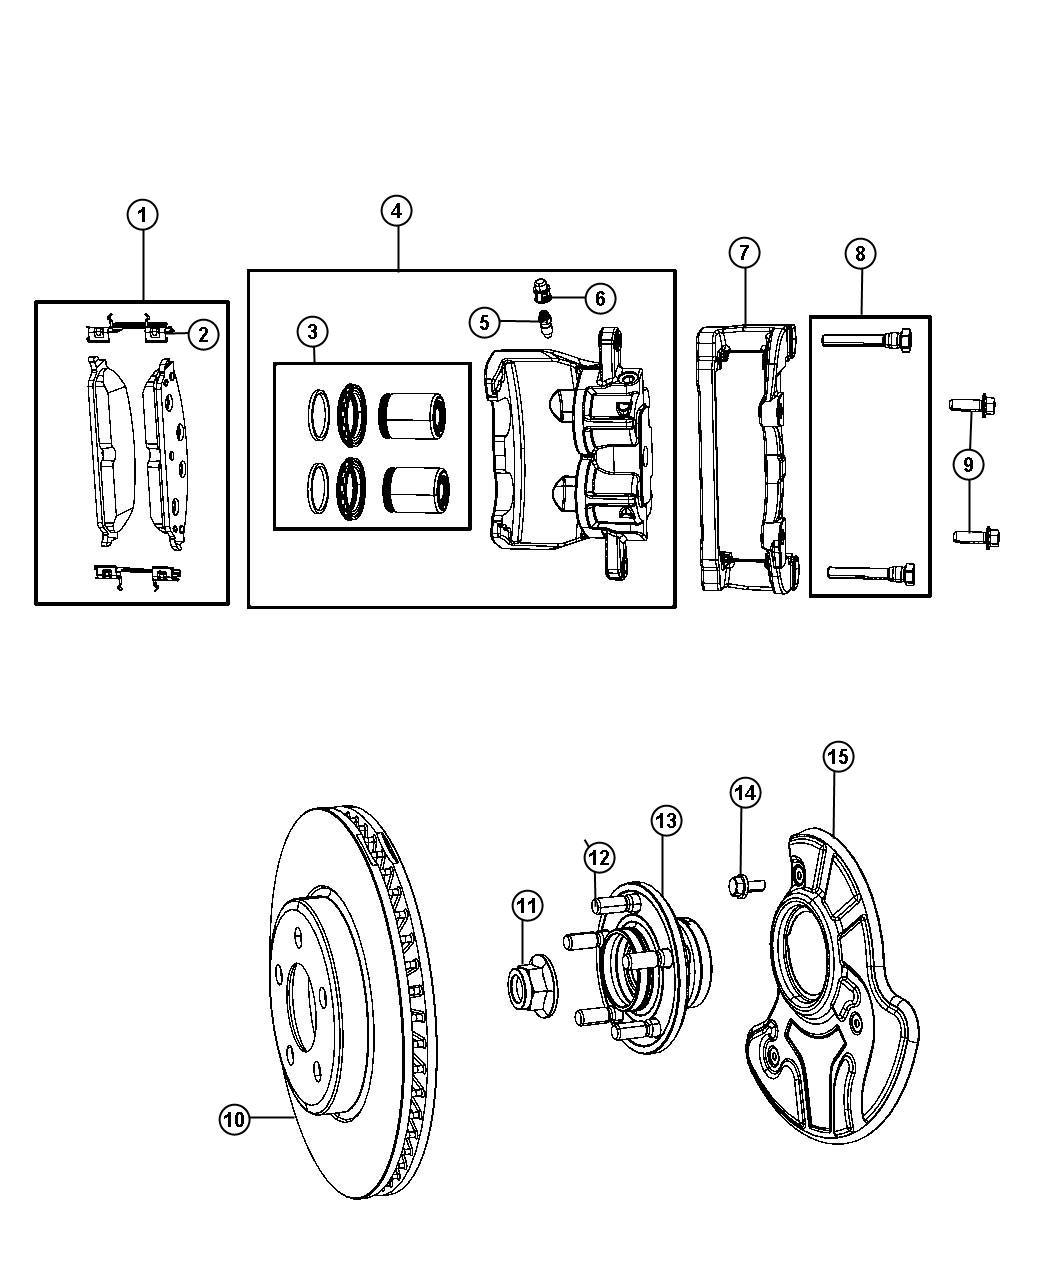 2017 Dodge Challenger Pin kit. Disc brake. Export. Brakes